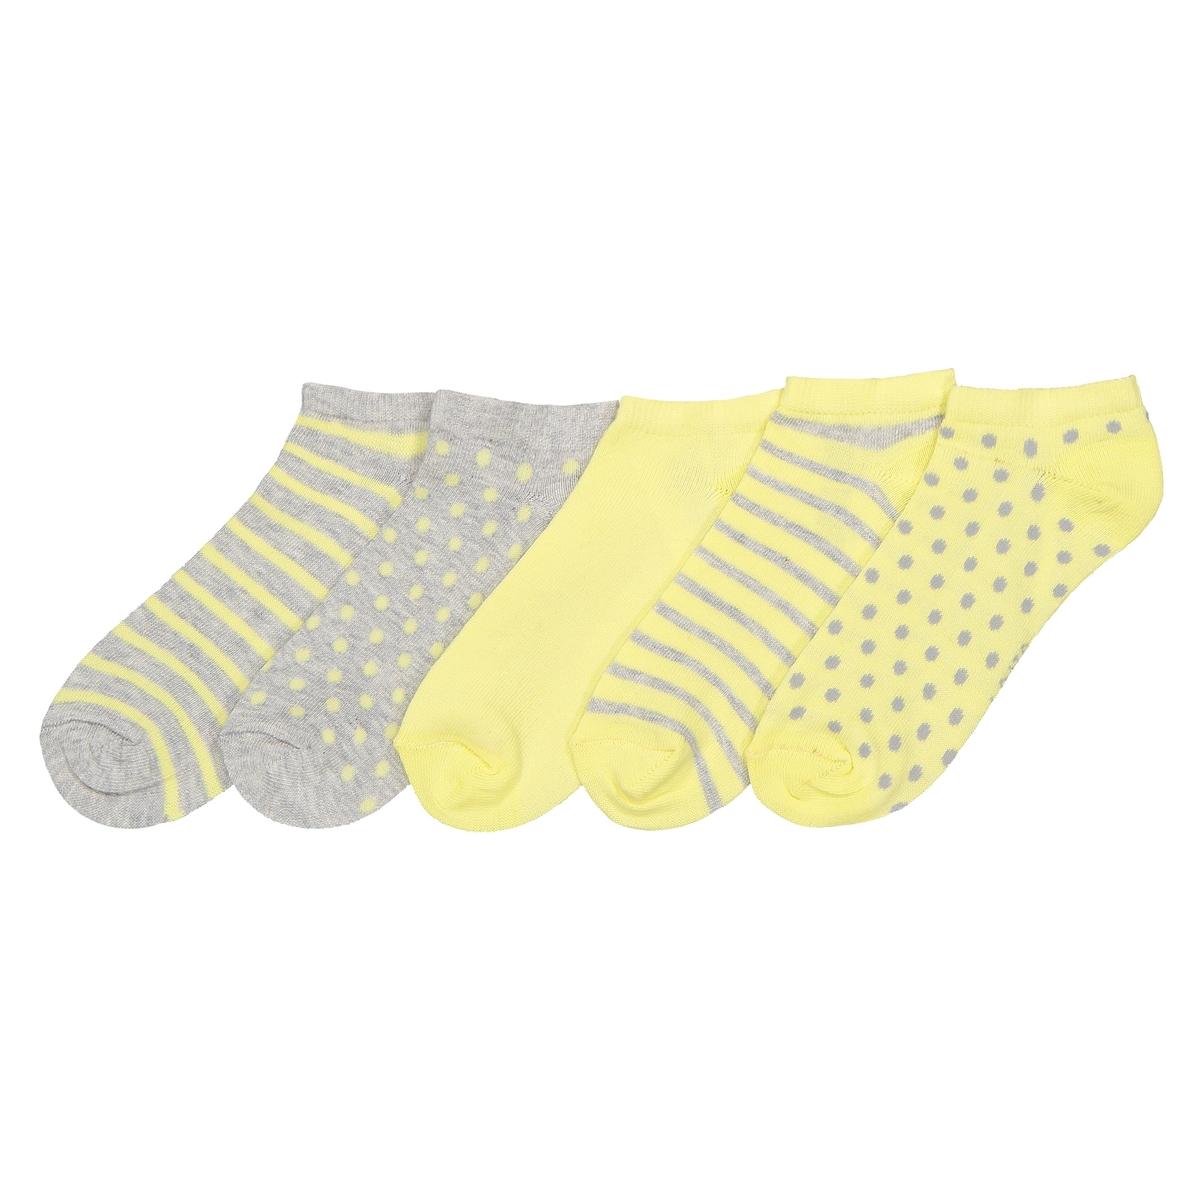 цена на Комплект из пар носков La Redoute Размеры - 27/30 серый